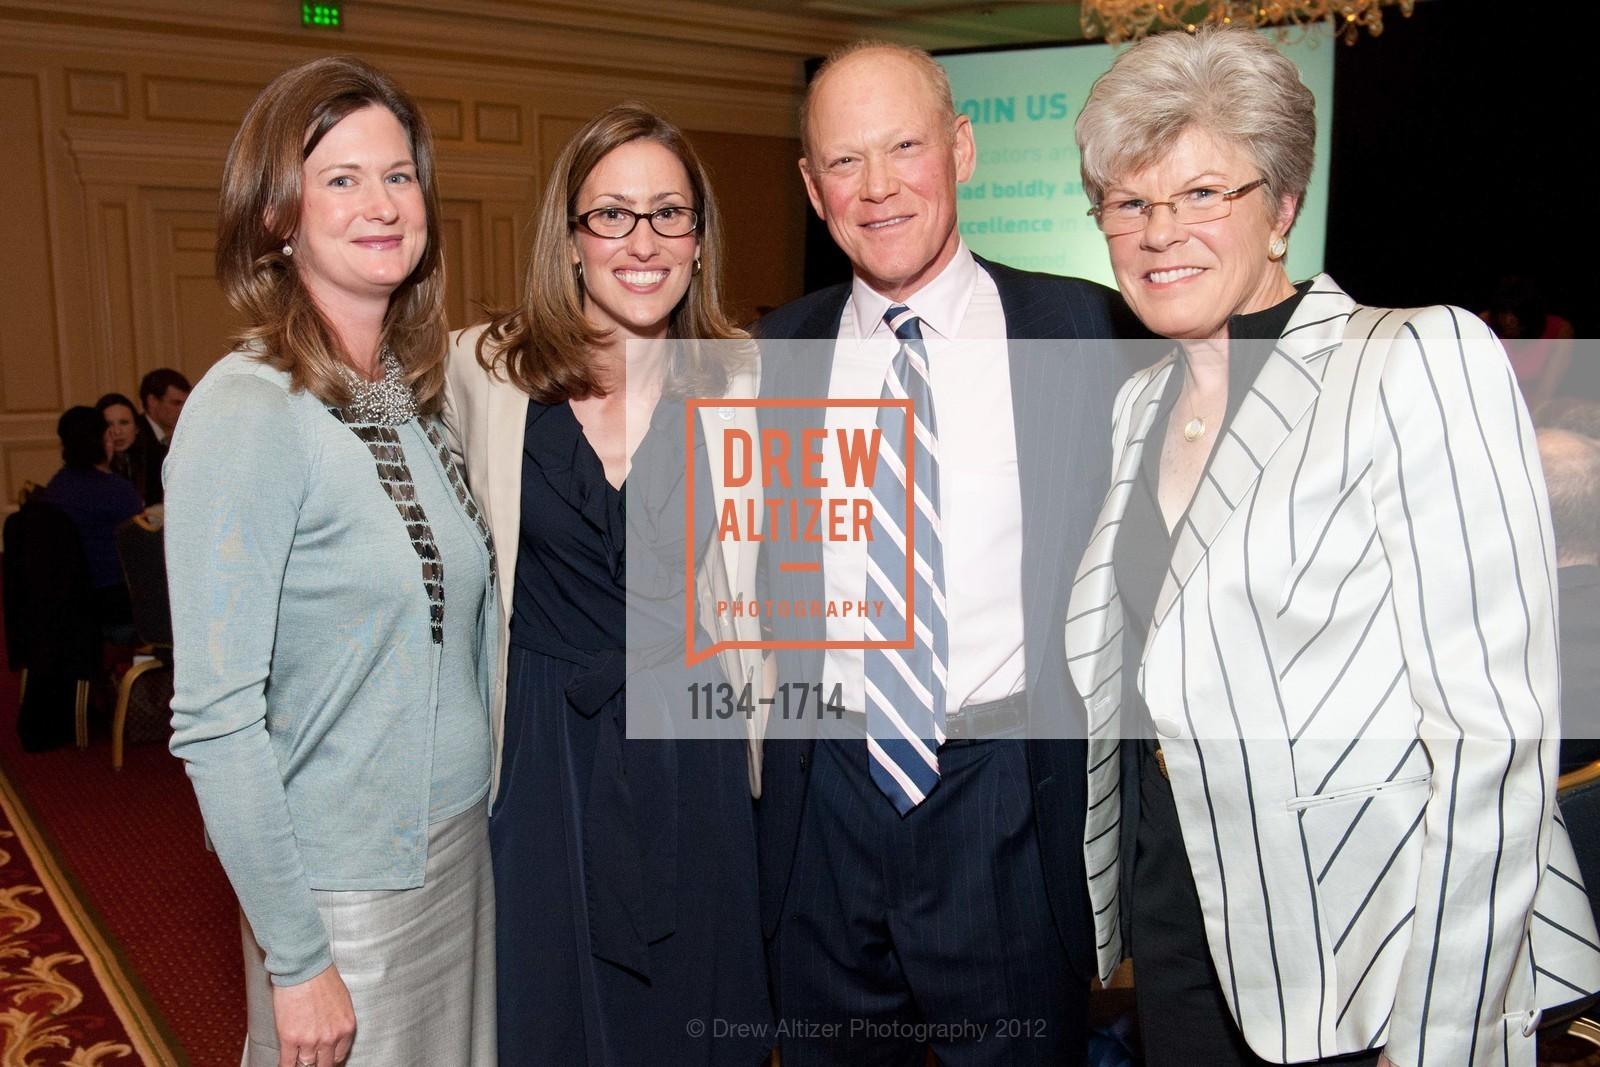 Beth Jenkyn, Emily Bobel, Jason Fish, Sharon Saunders, Photo #1134-1714